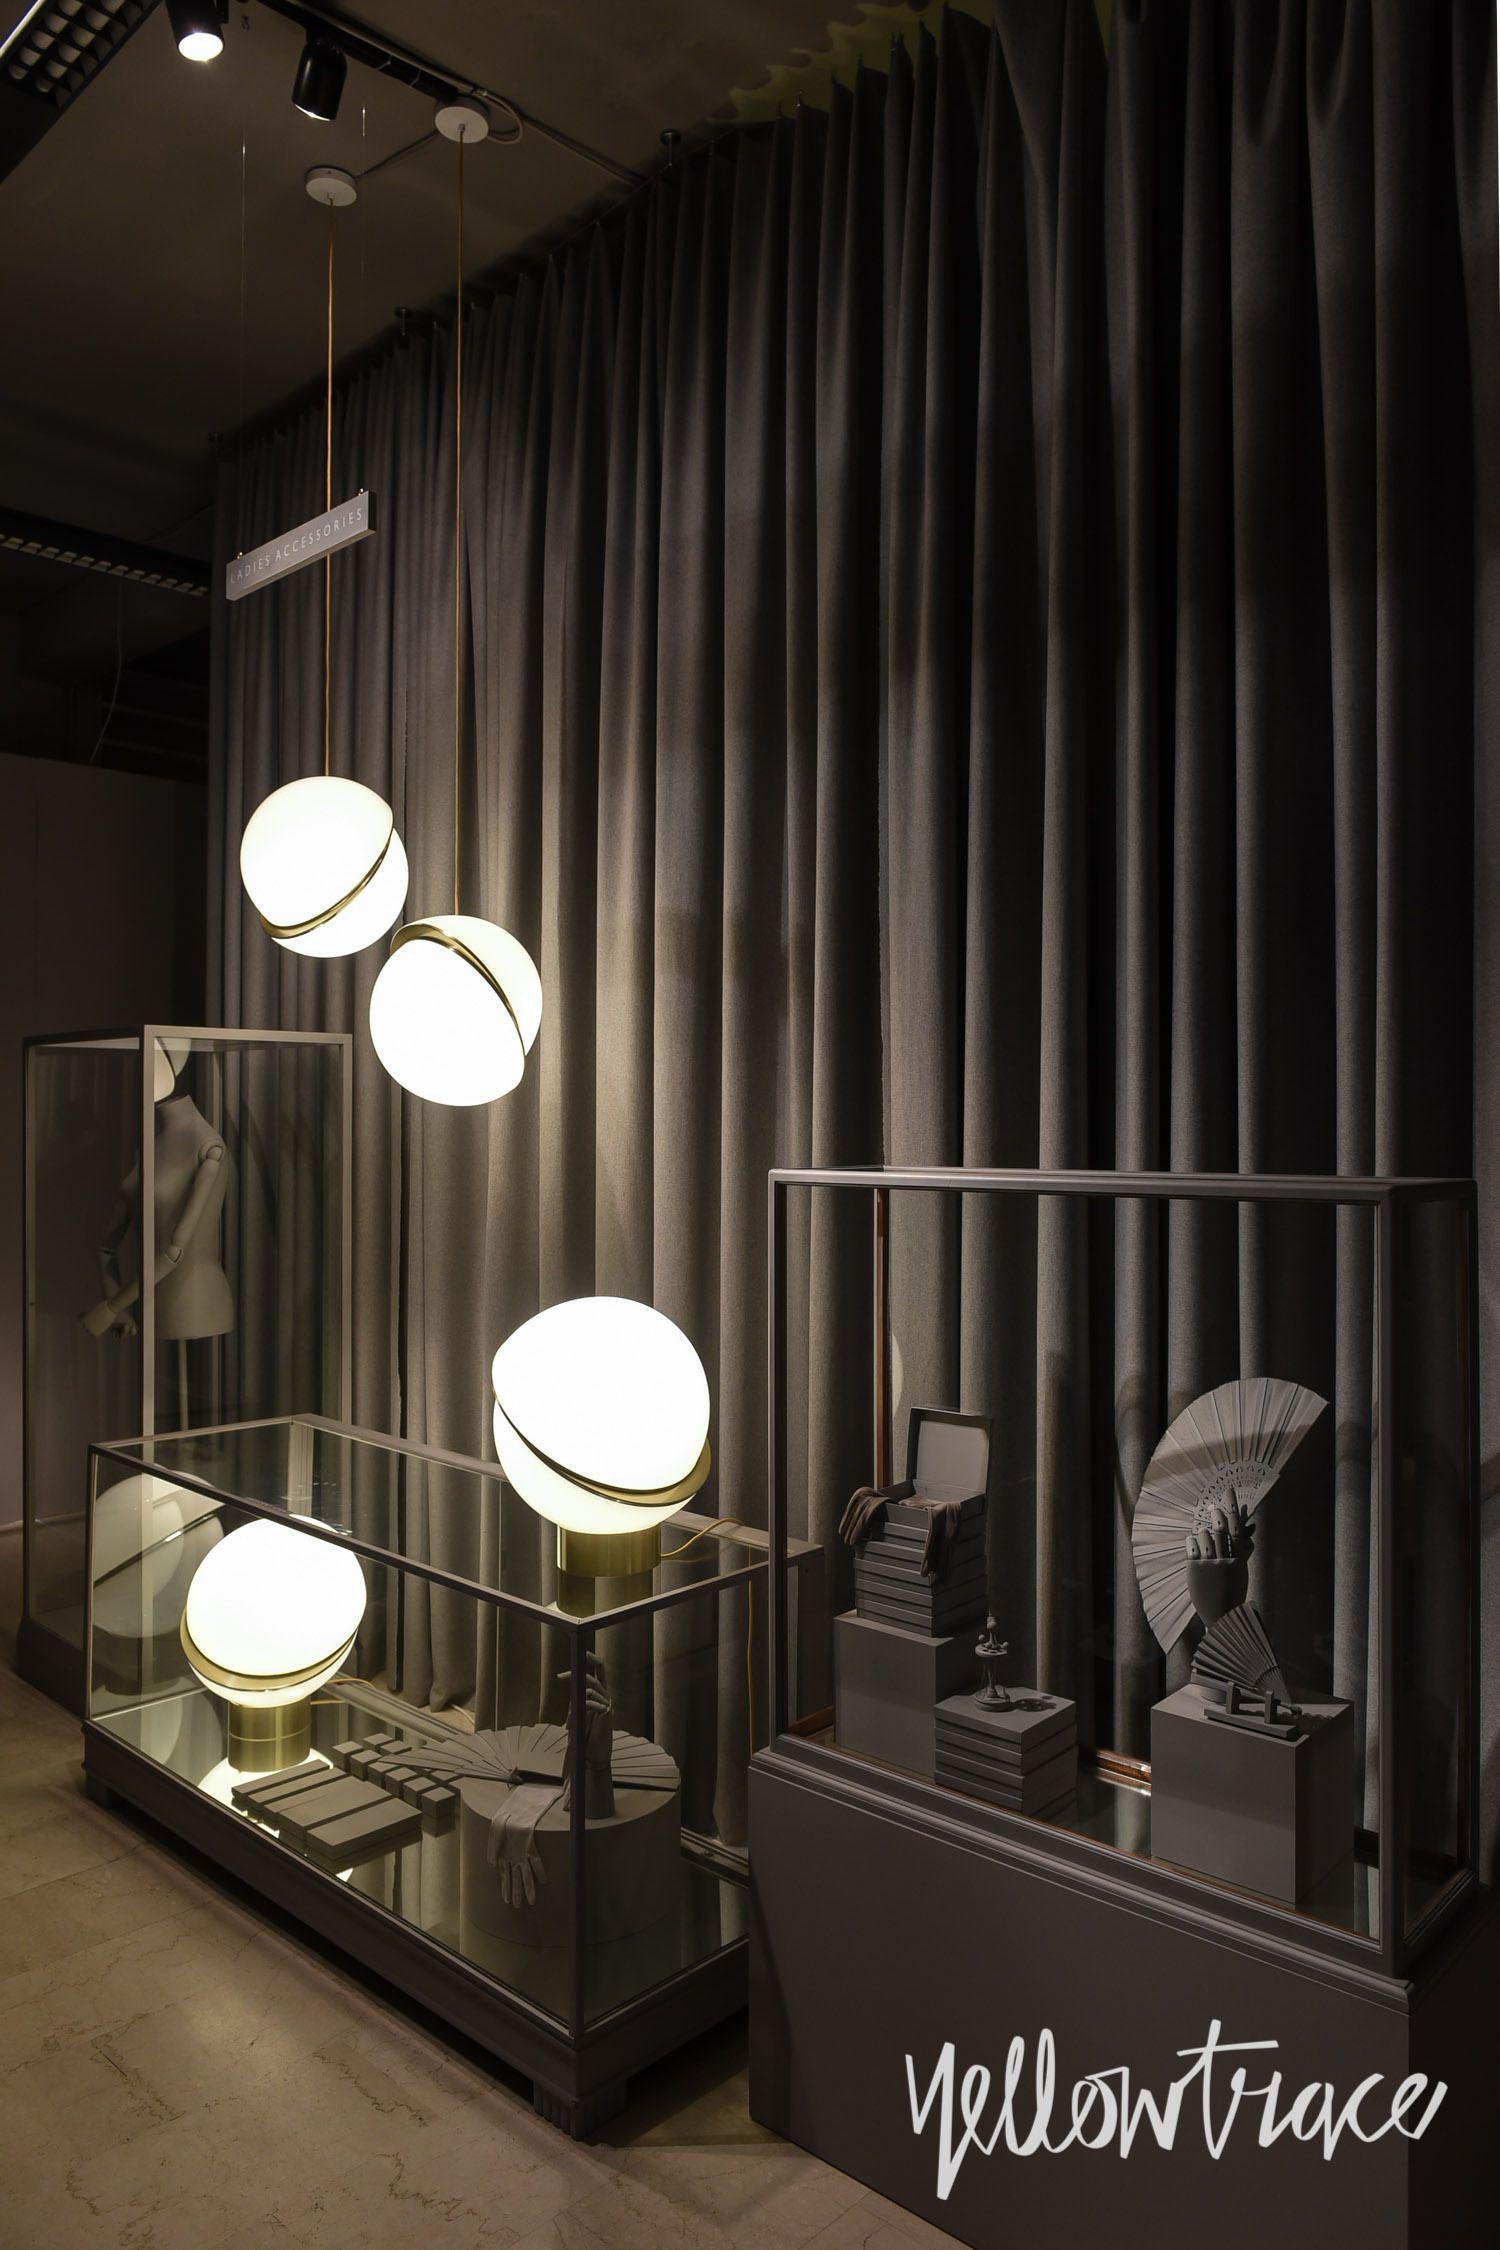 San Gregorio DOCET Highlights Milan Design Week 2015